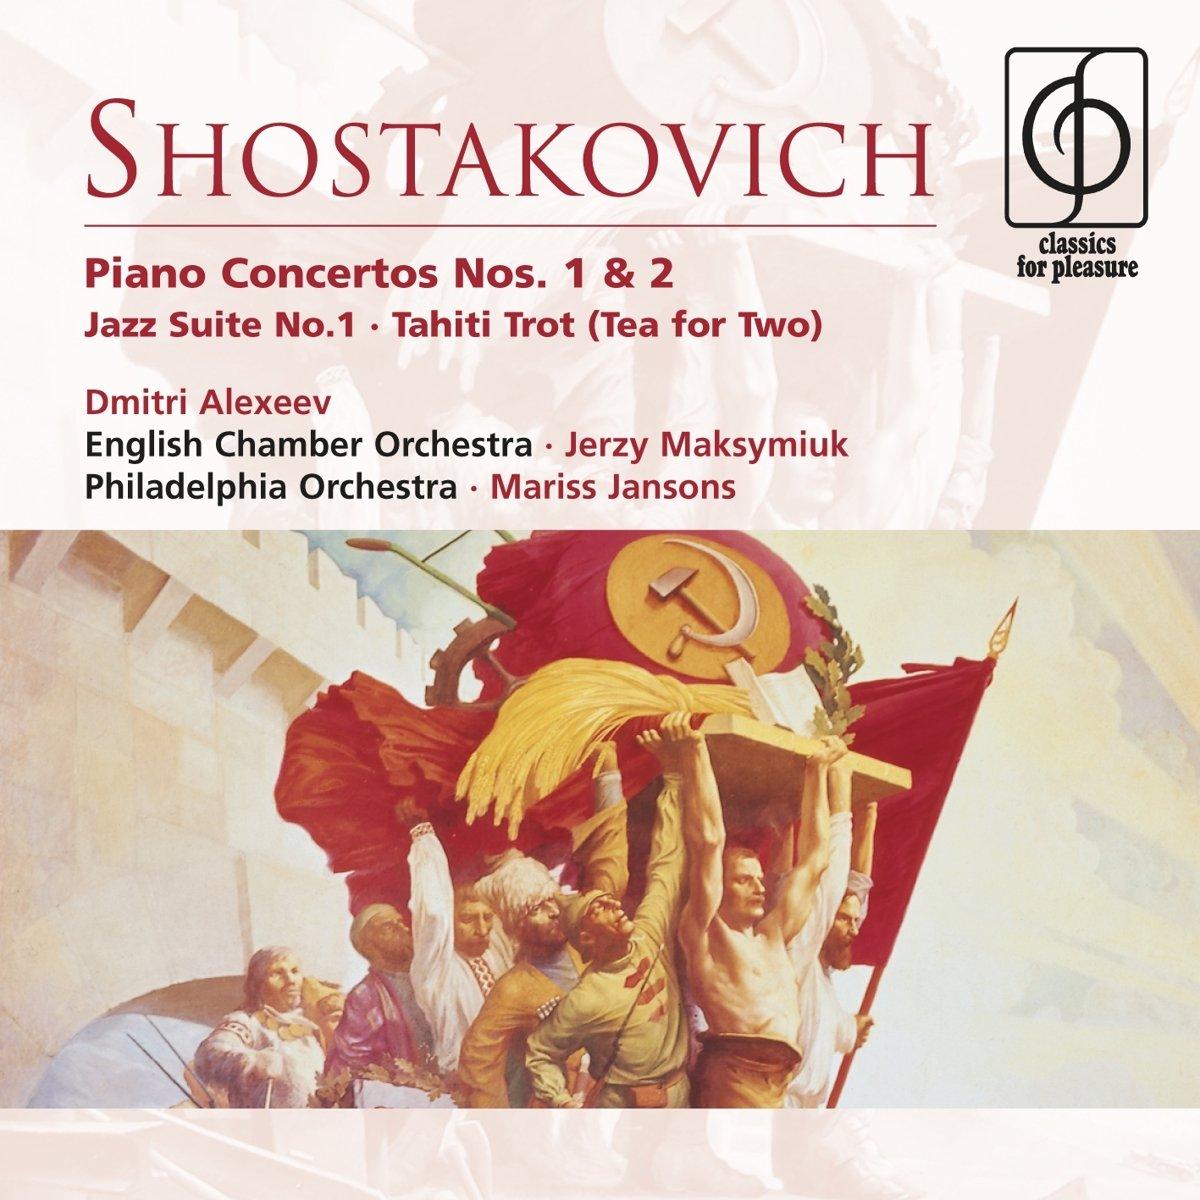 Shostakovich: Piano Concertos Nos. 1 & 2; Jazz Suite No. 1; Tahiti Trot (Tea for Two)